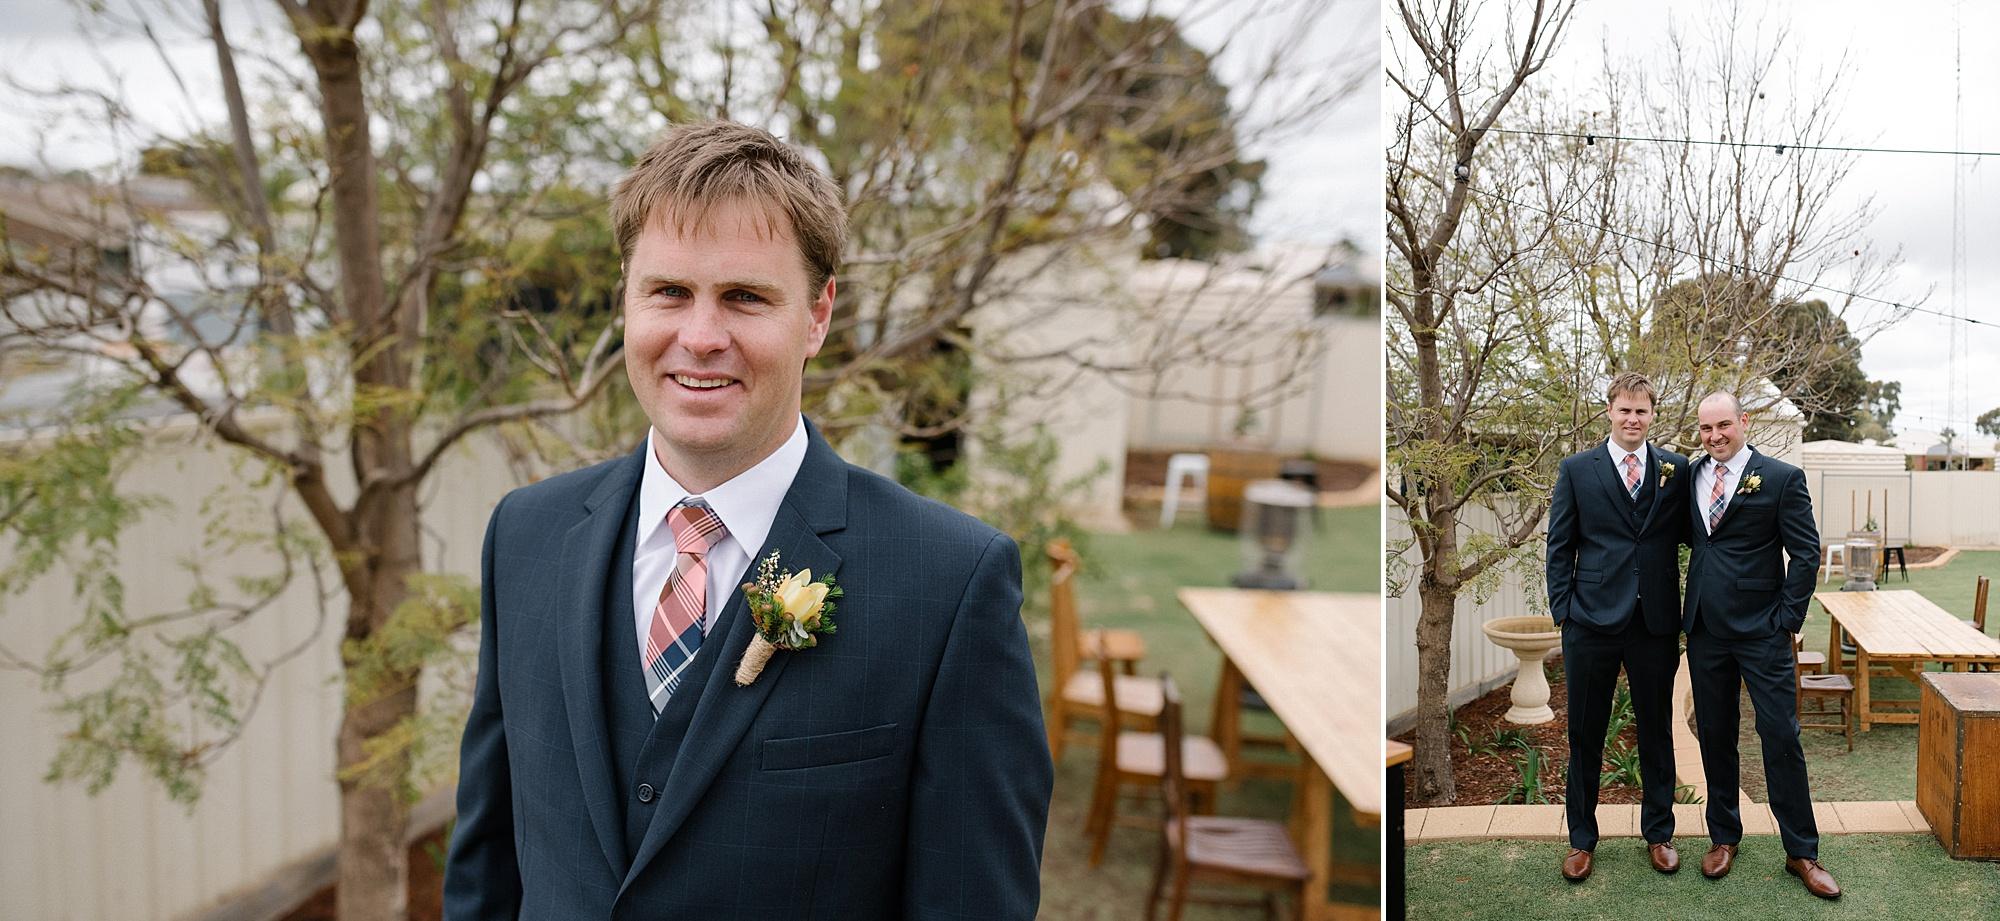 Yorke Peninsula Wedding Photographer